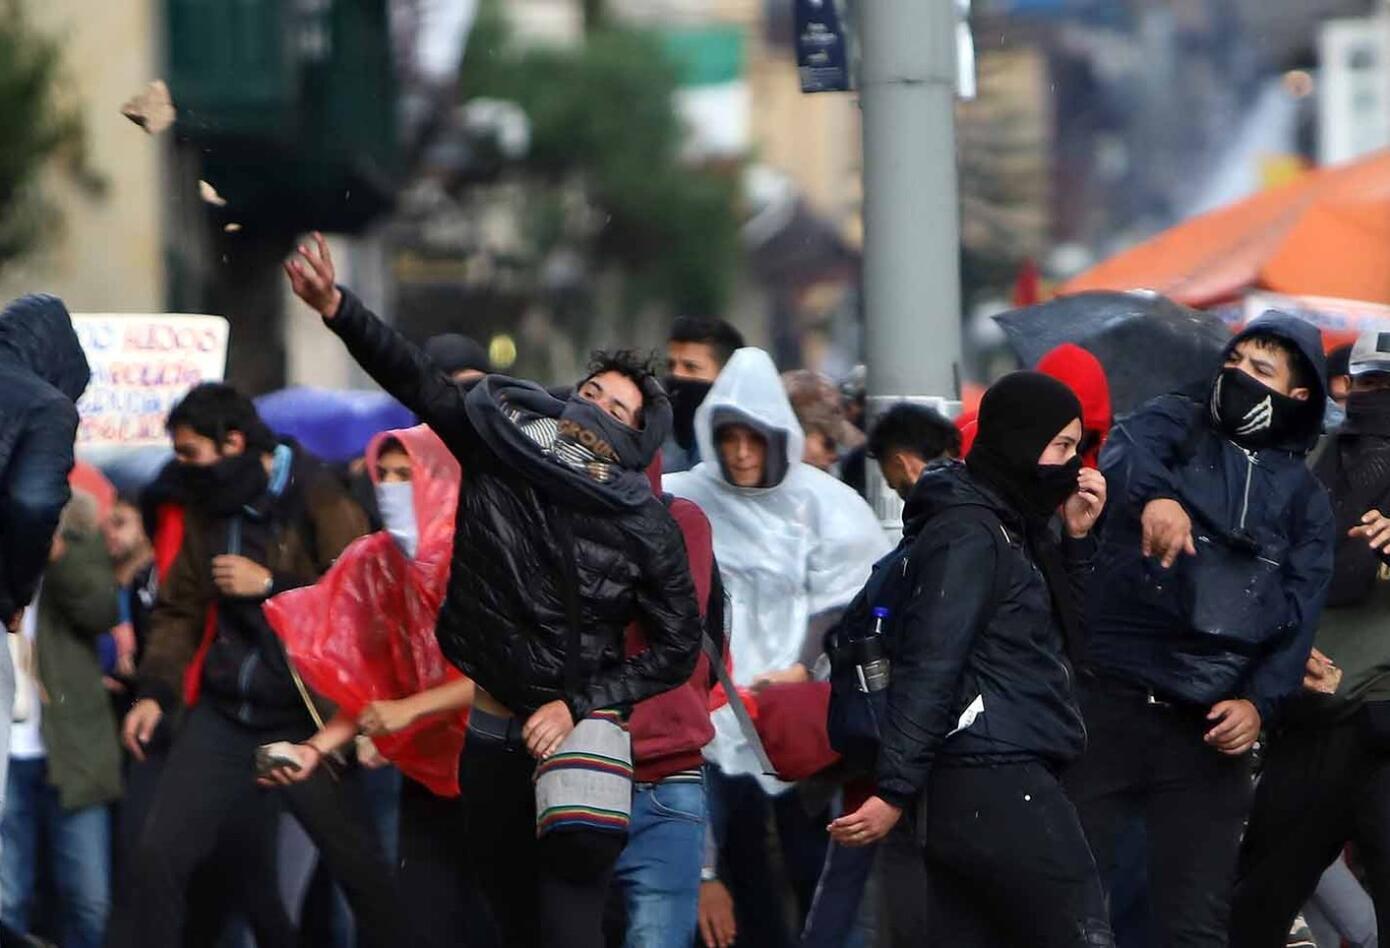 Marcha de estudiantes terminó en fuertes desmanes, en Bogotá